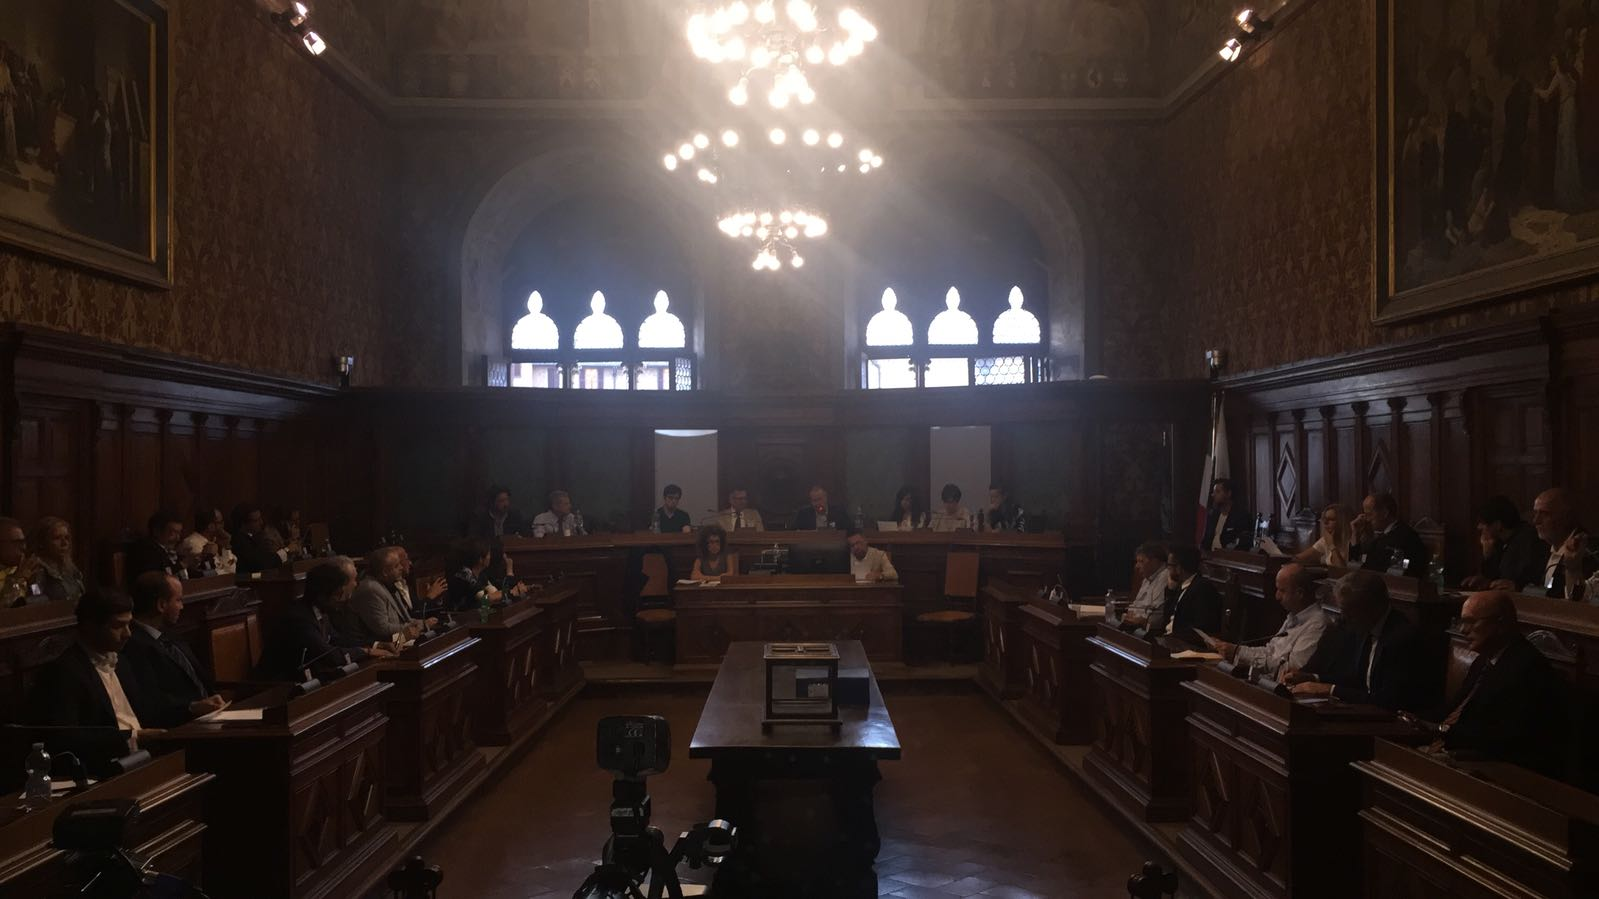 Palio straordinario, al via la seduta del consiglio comunale